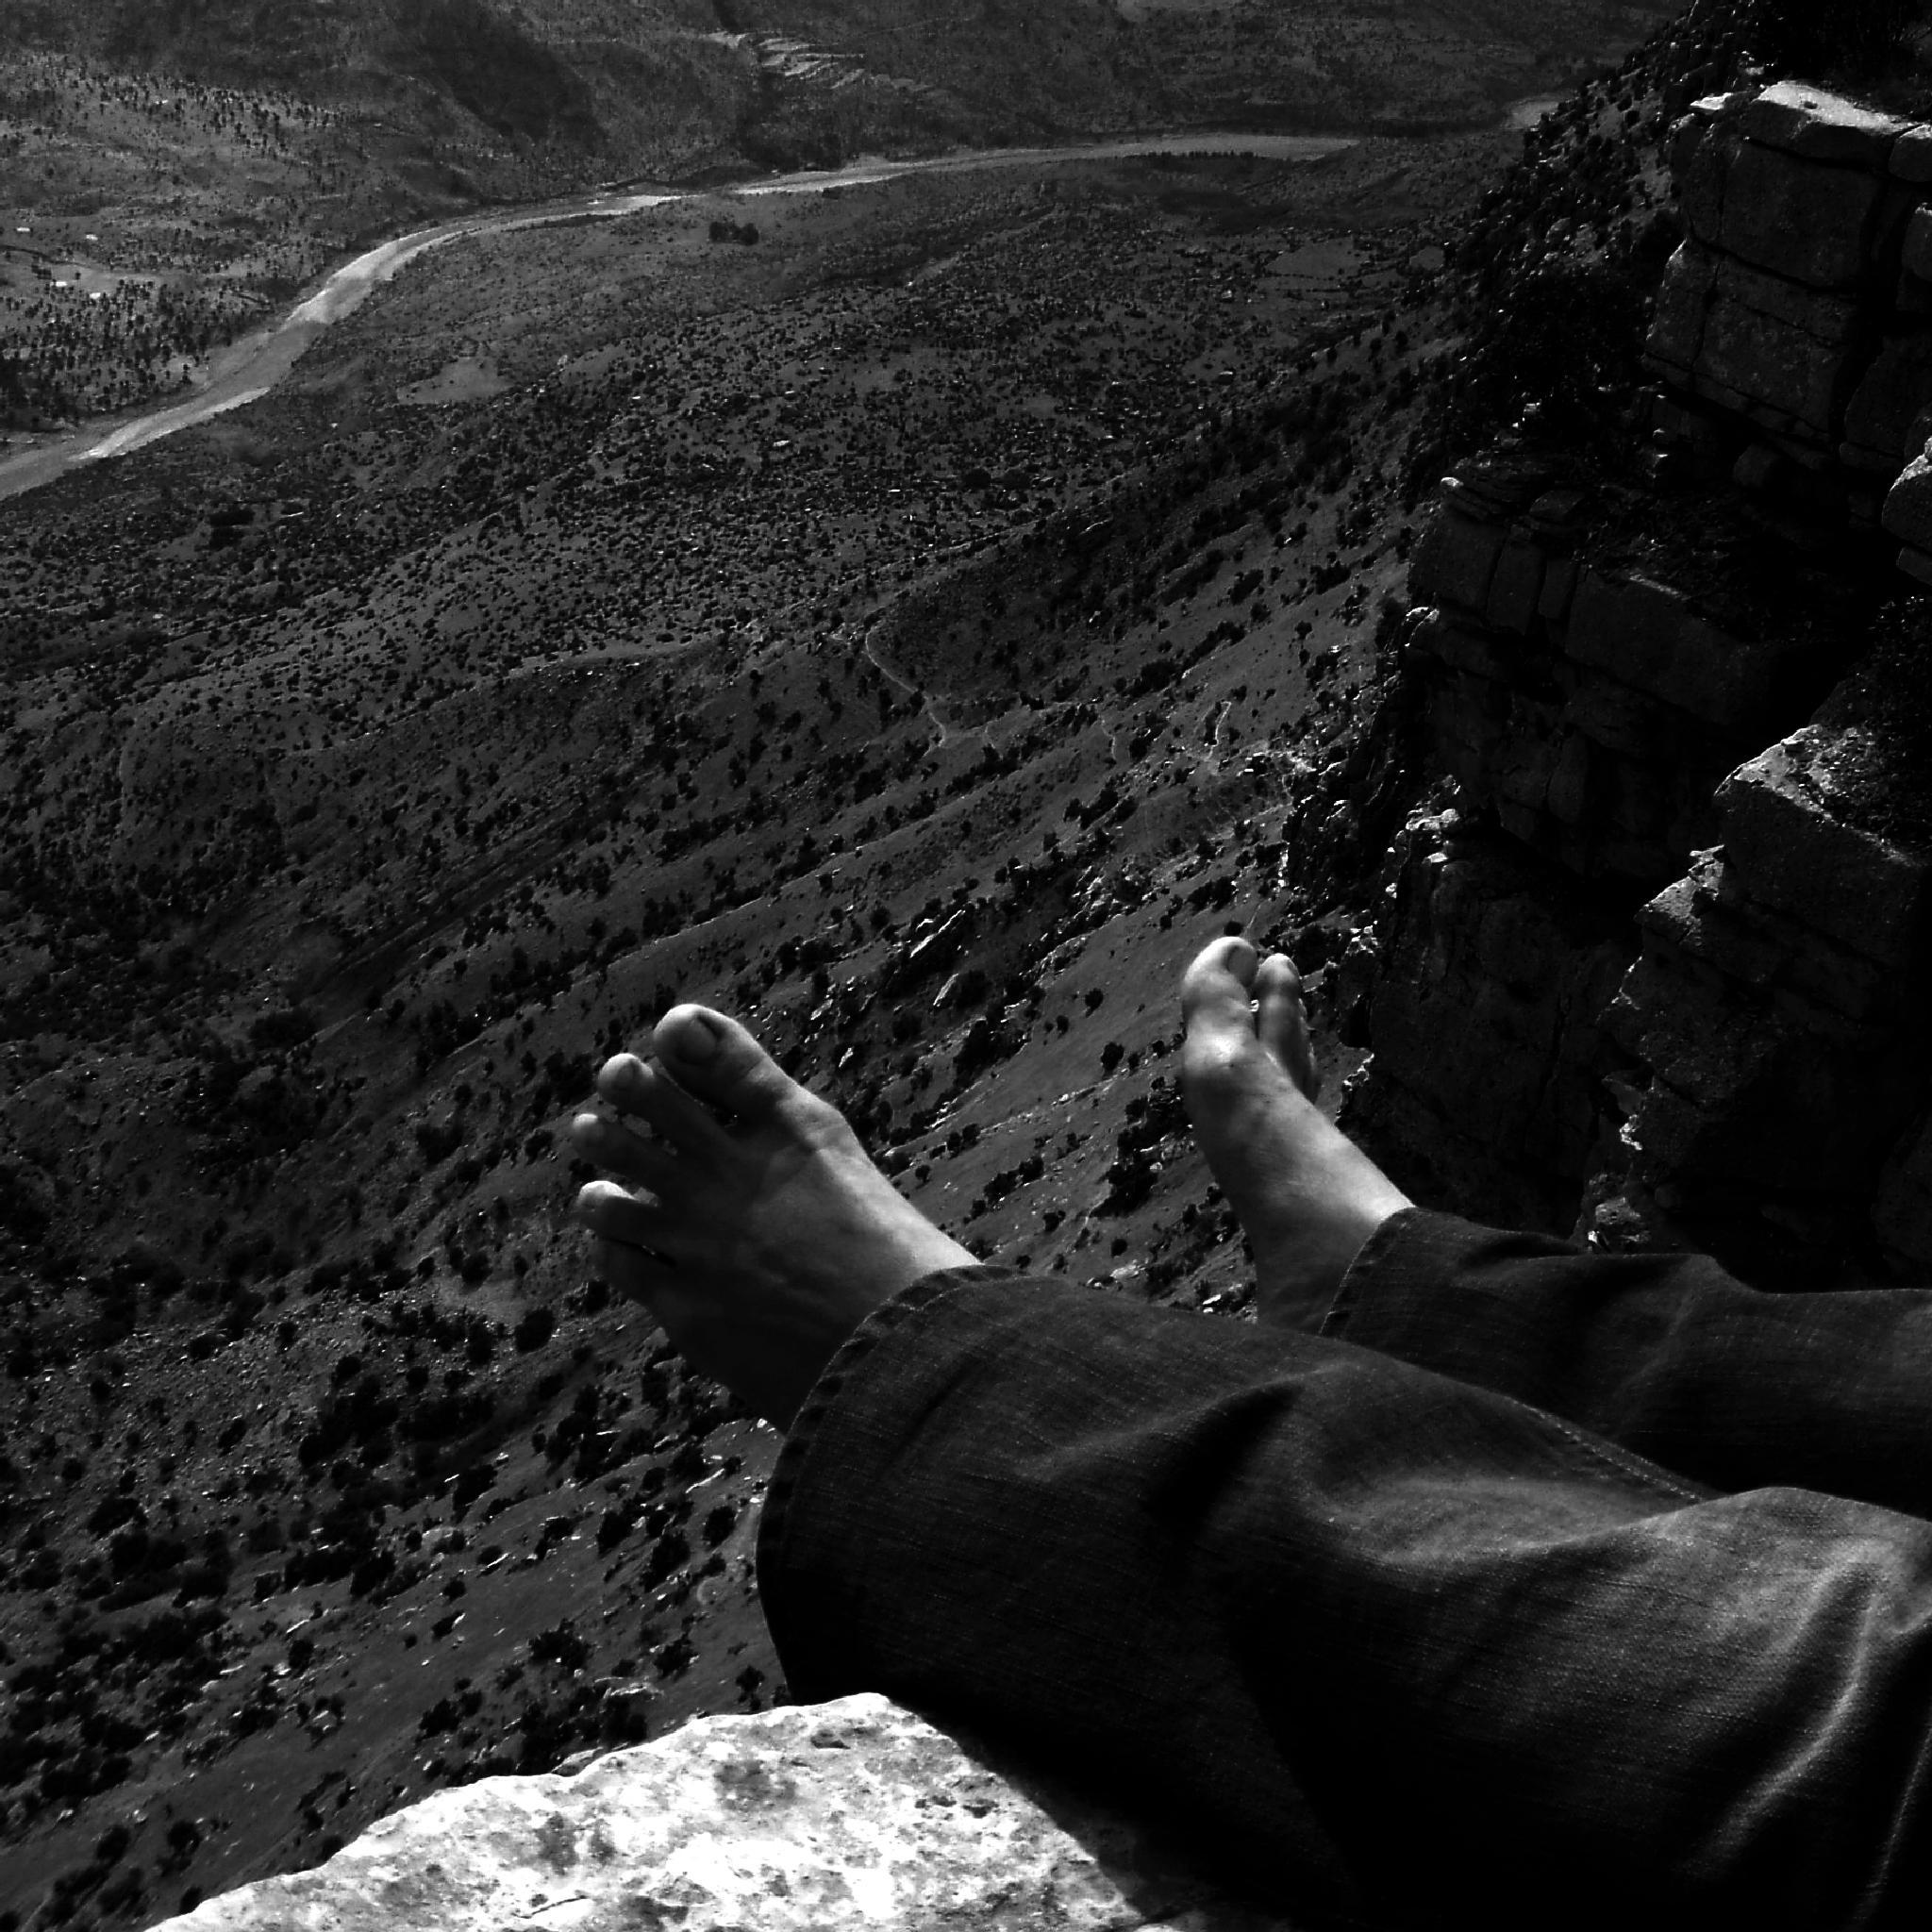 Under my feet by boranfot2